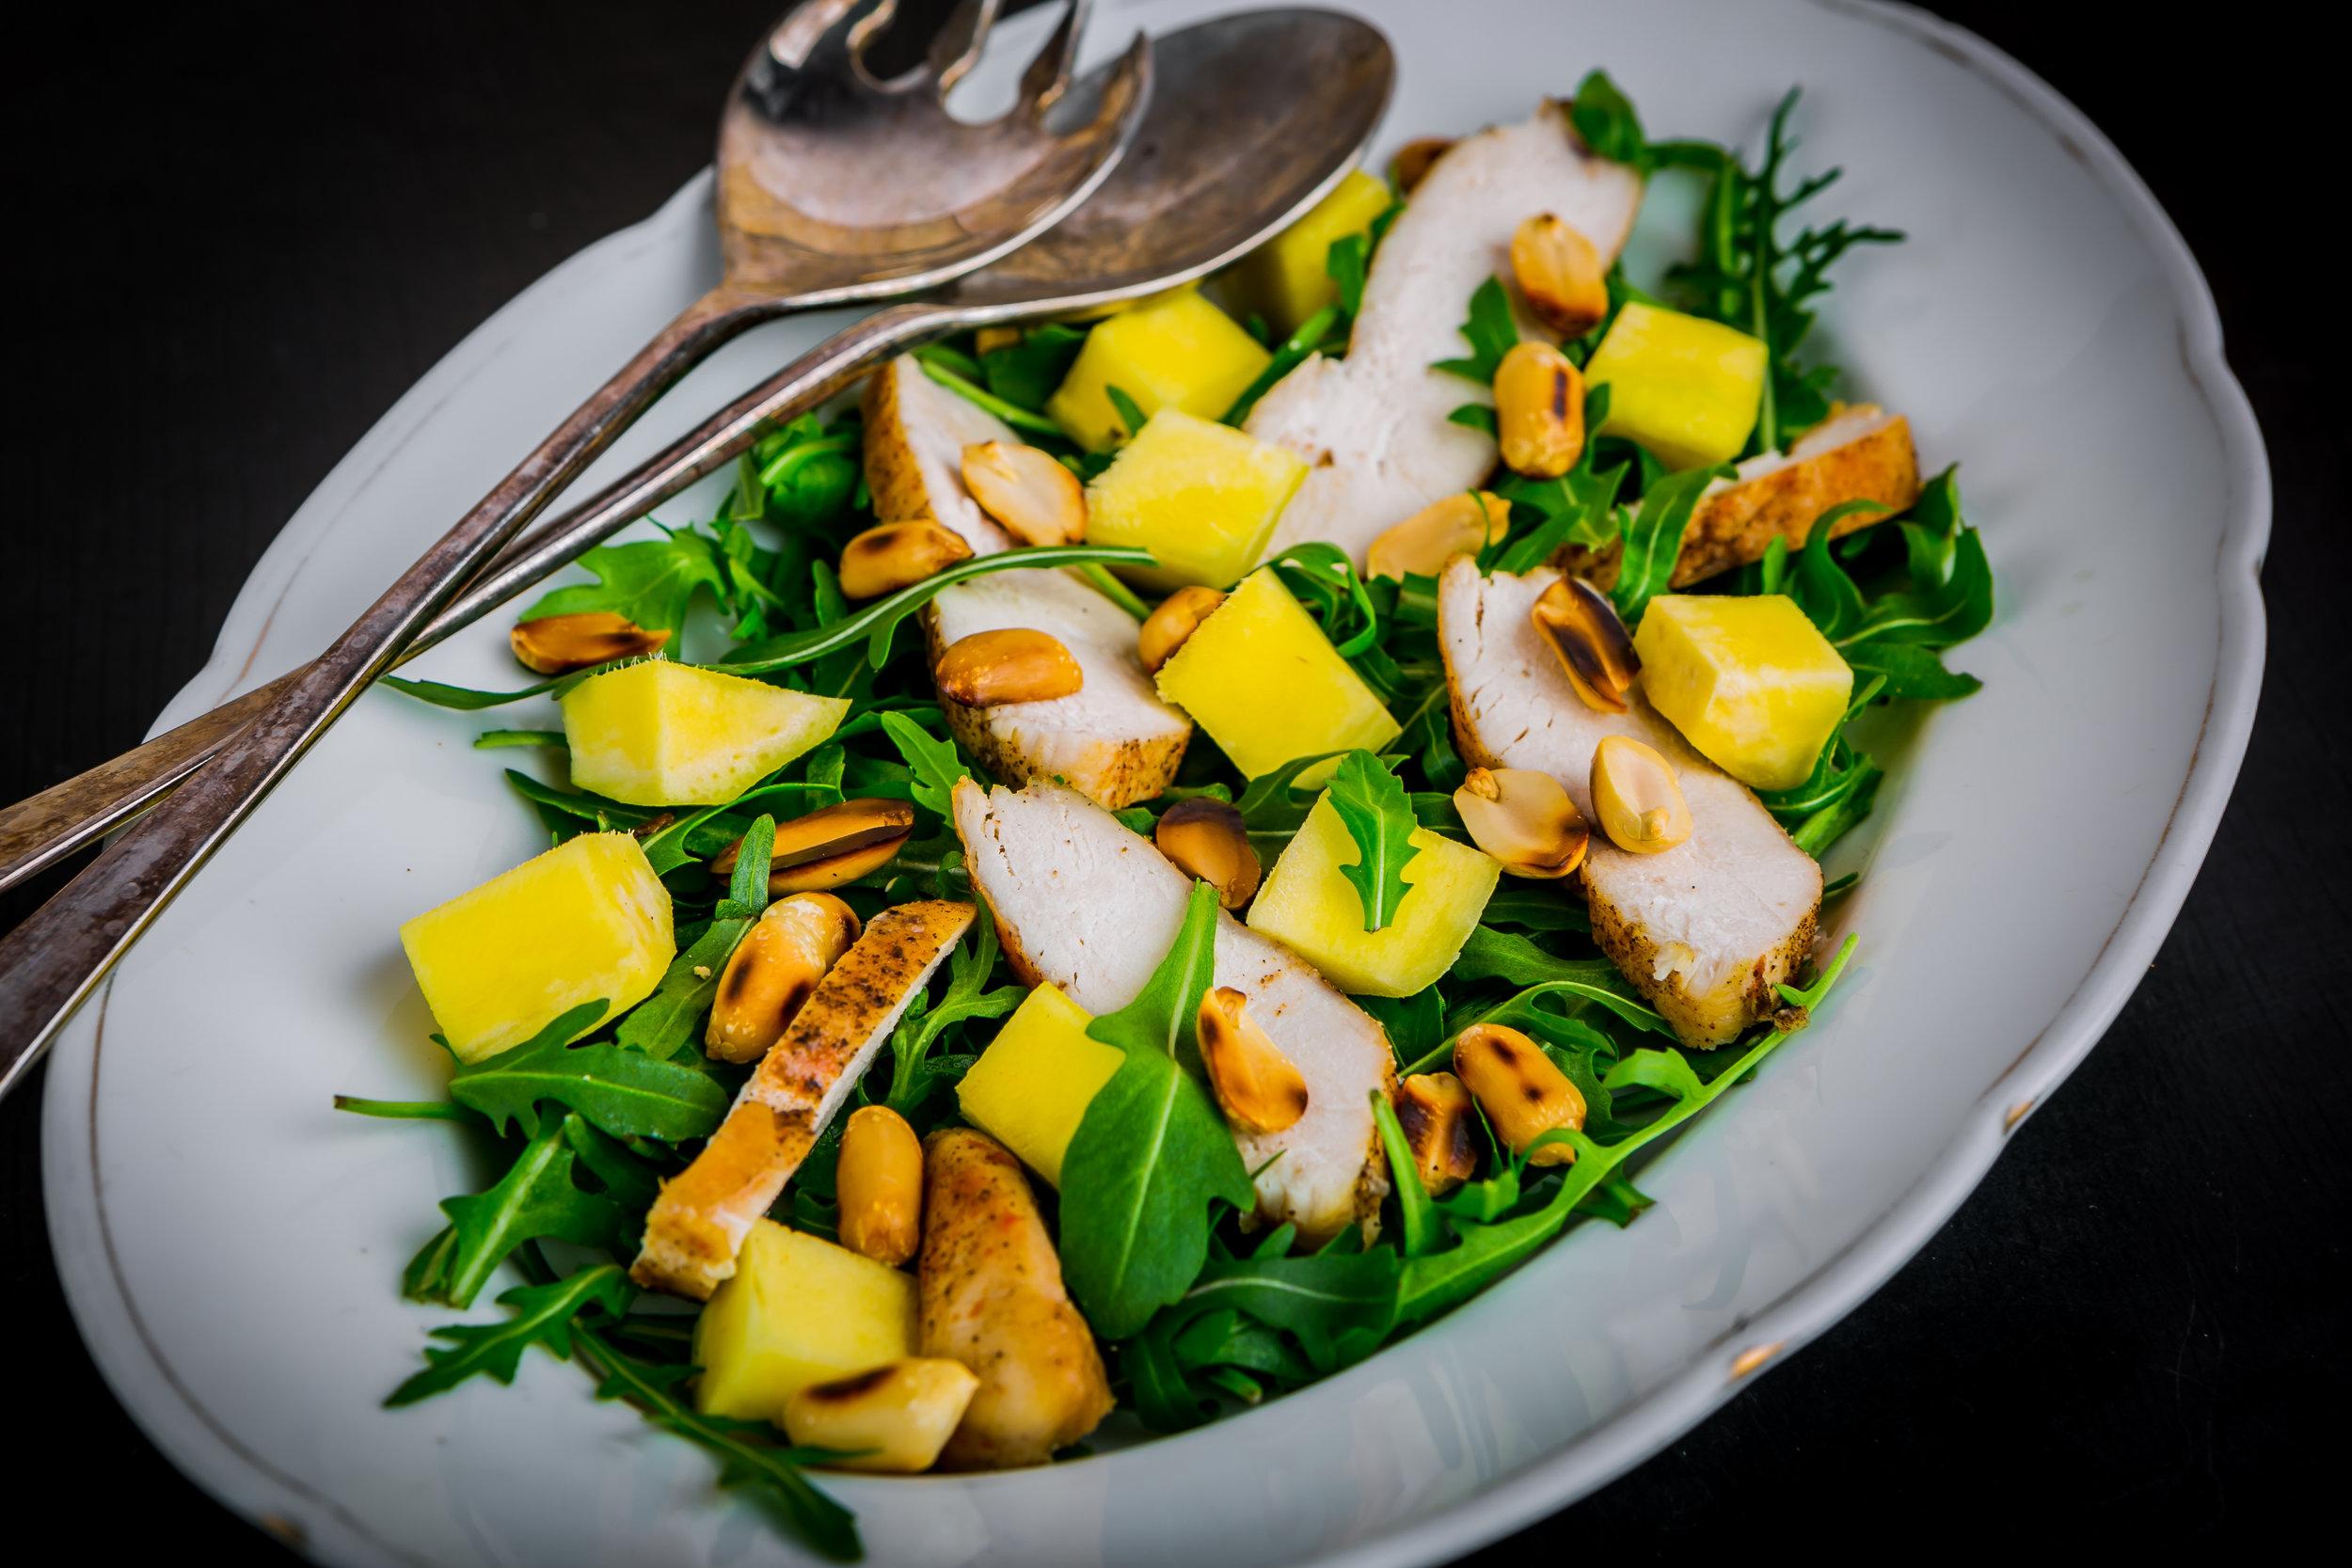 Online Personal Trainer Lunch Recipes -Chicken & Mango Salad.jpg